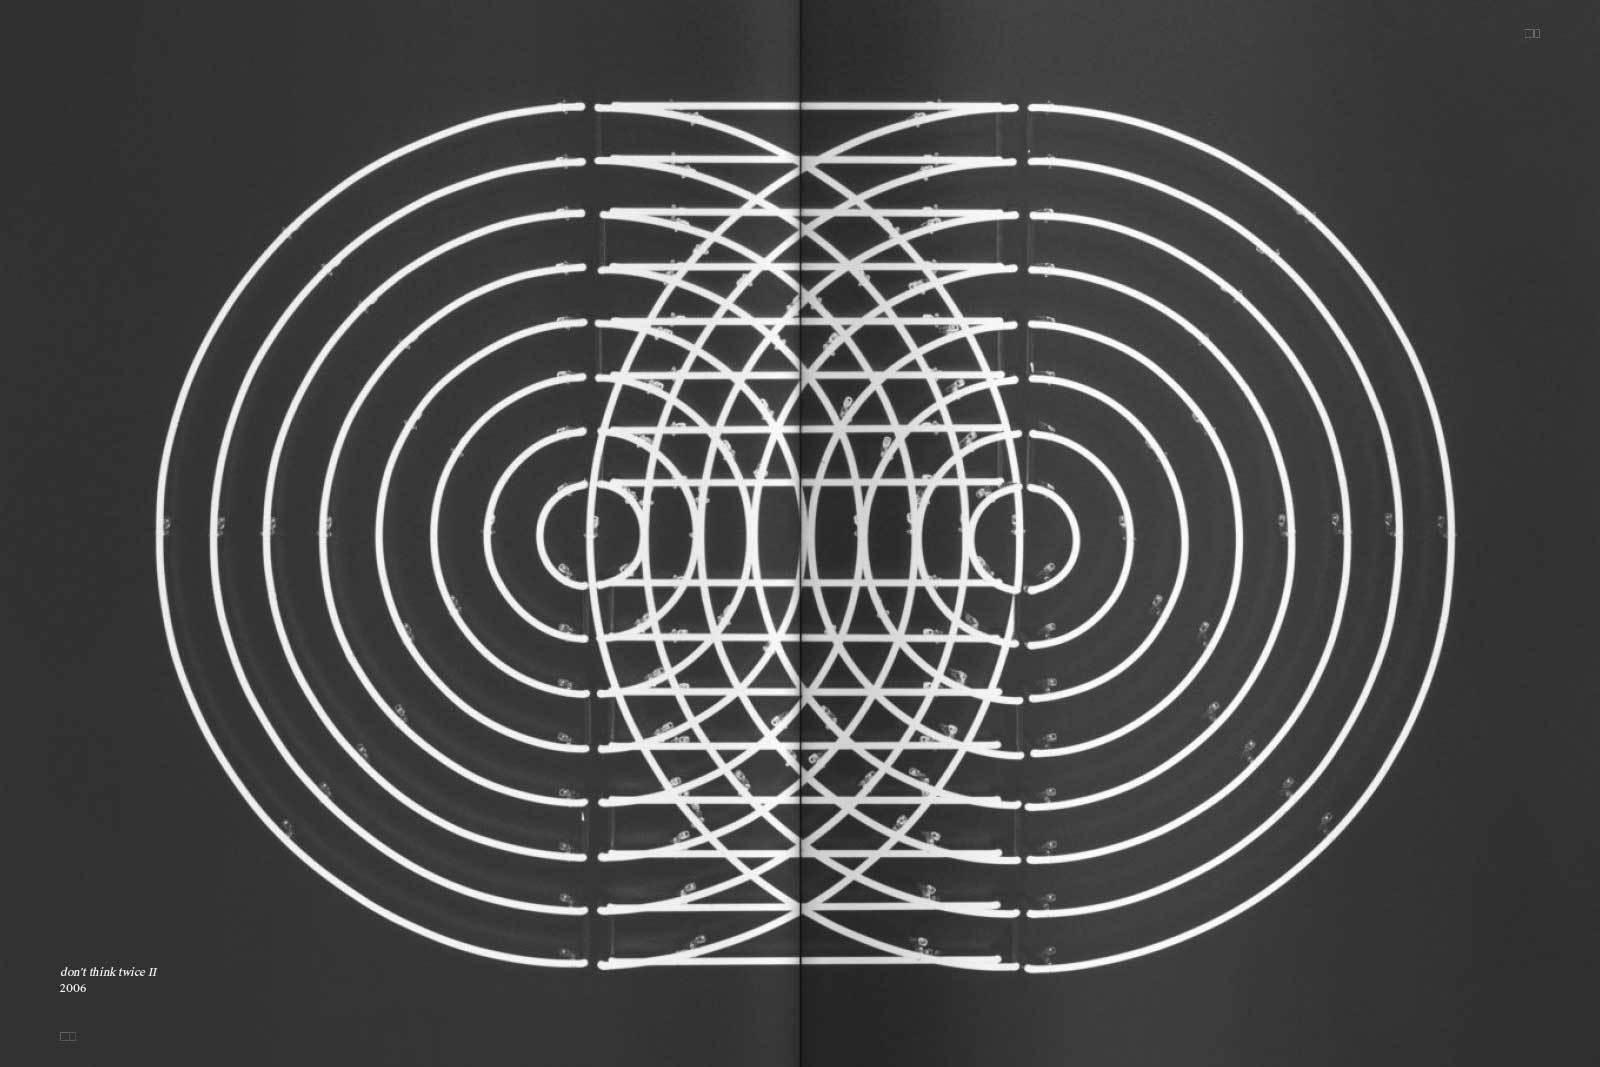 Doug Aitken spread13